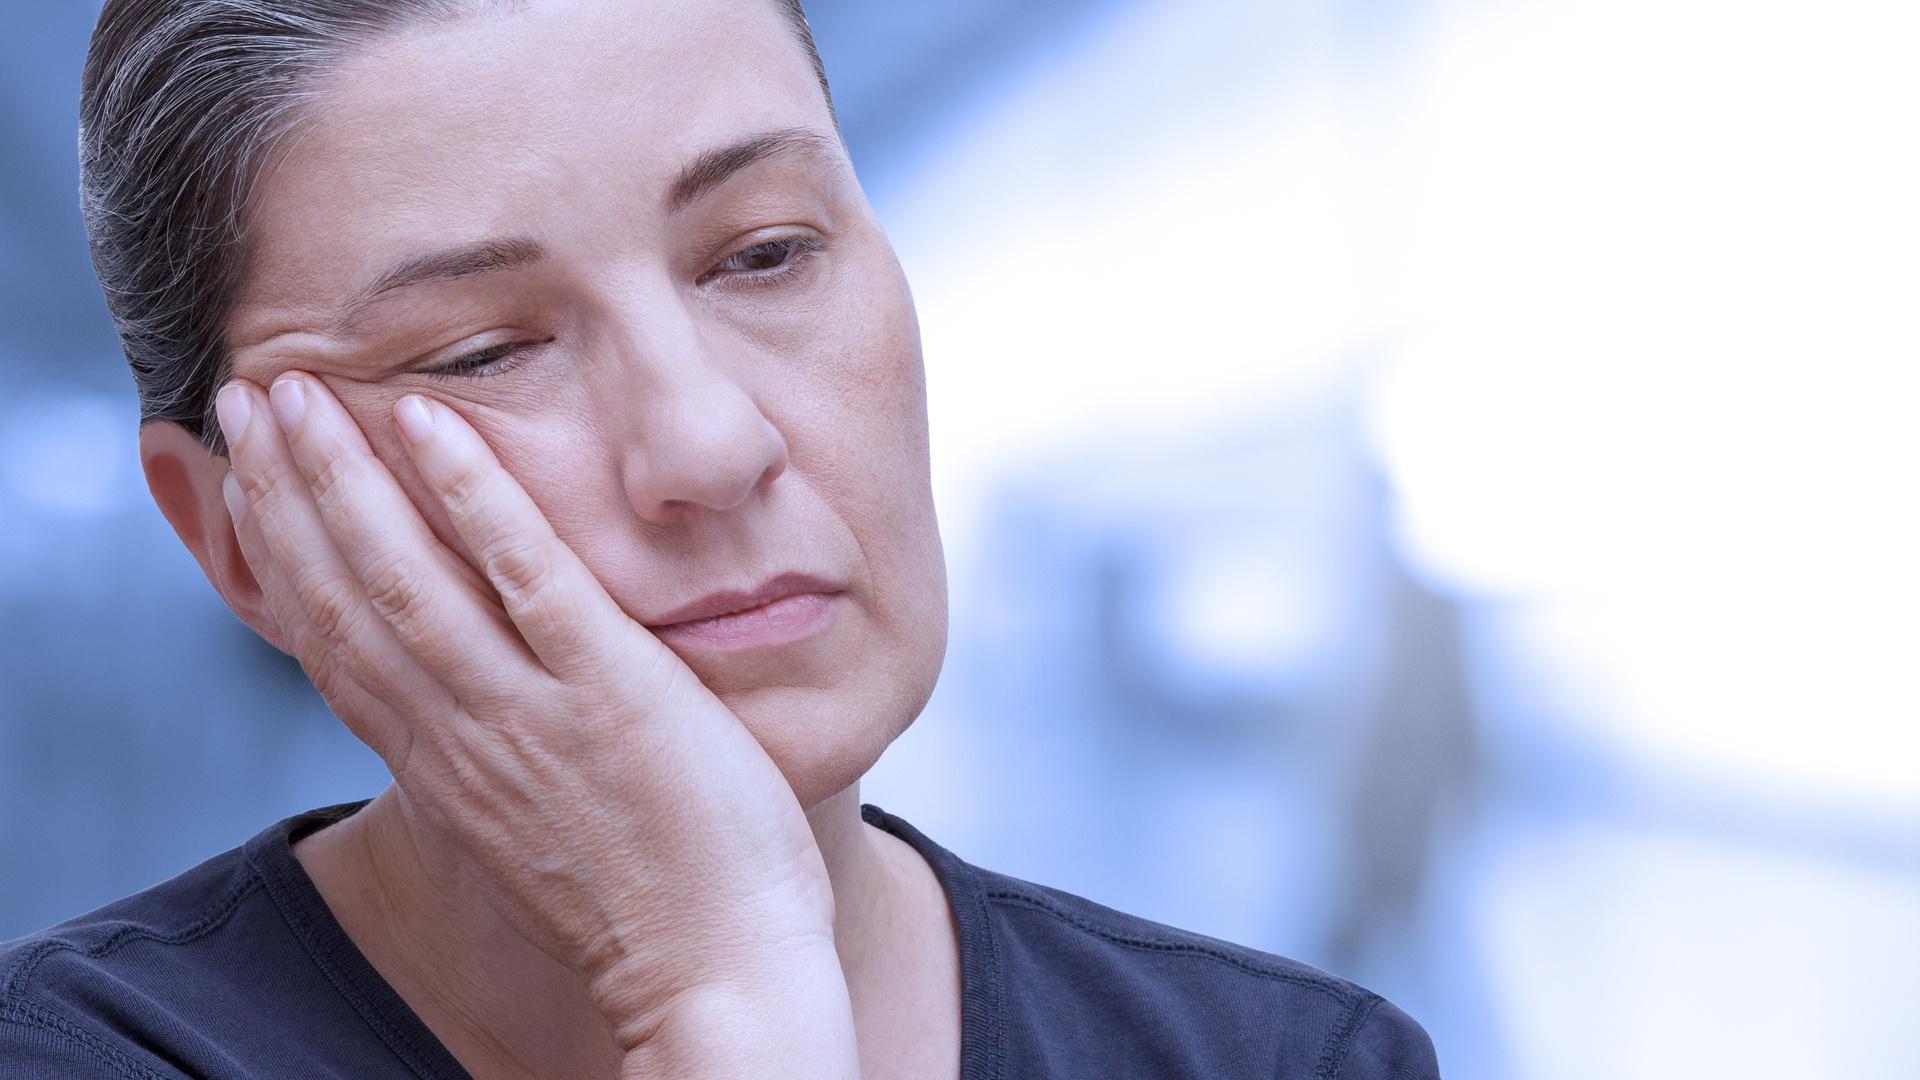 Juez reconoce invalidez absoluta a mujer con Fibromialgia y Fatiga Crónica